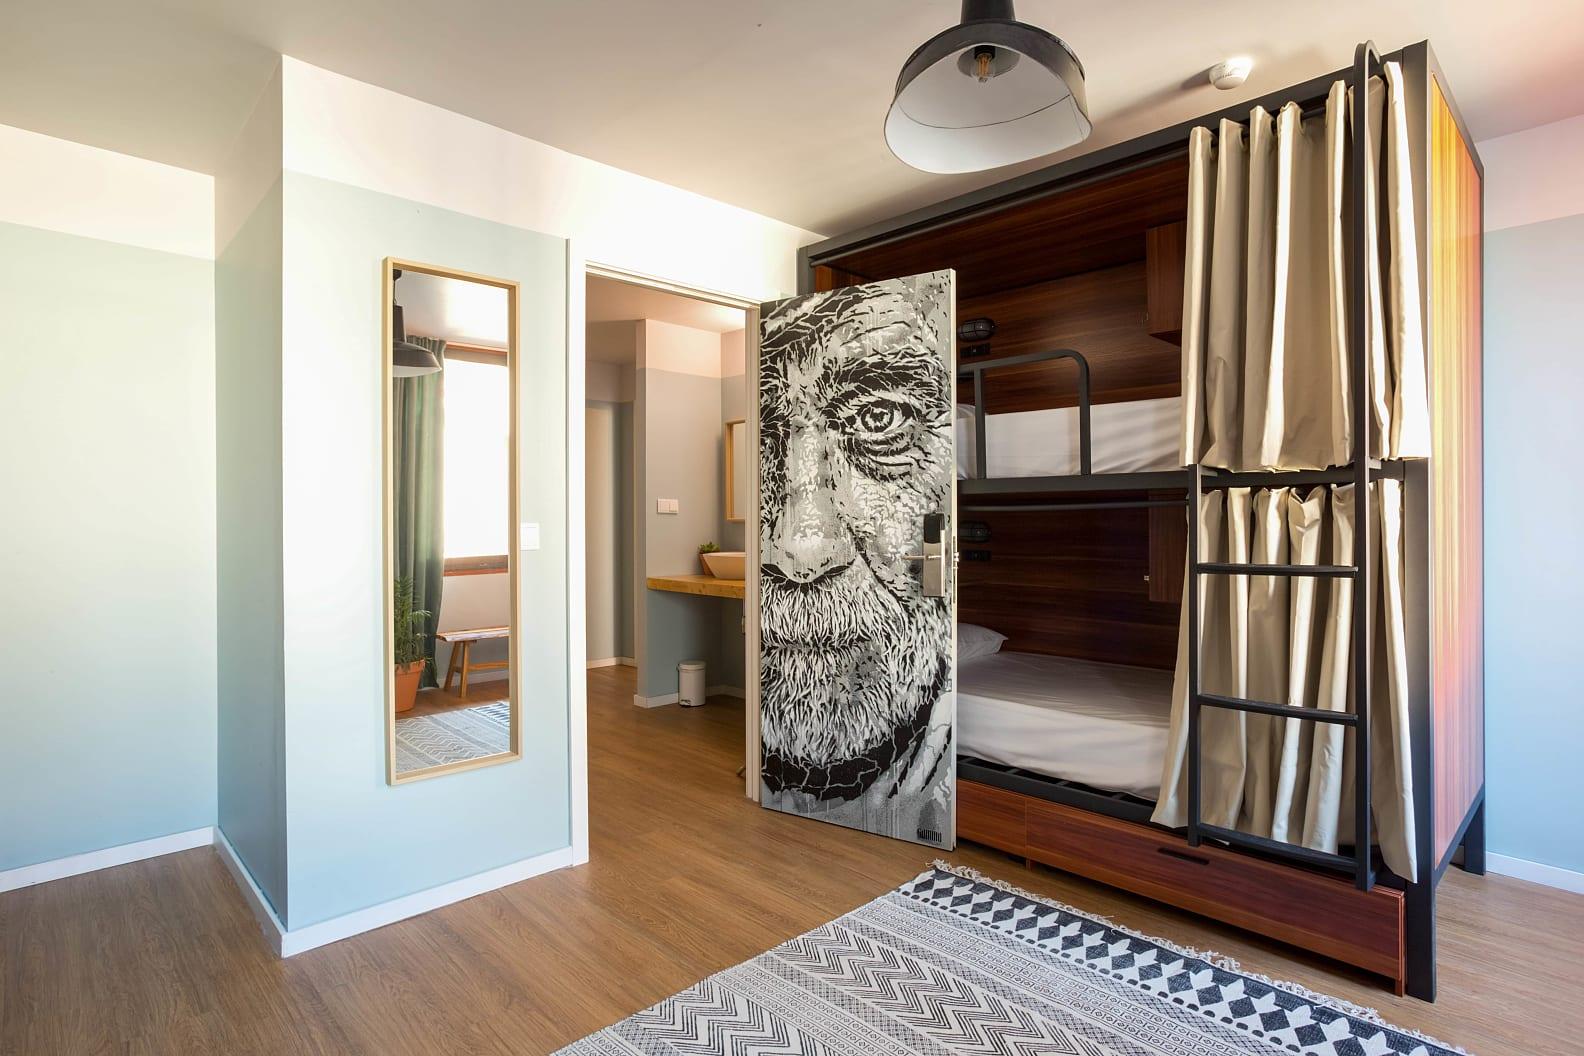 Selina-Lisbon-Secret-Garden-Rooms-Dorm